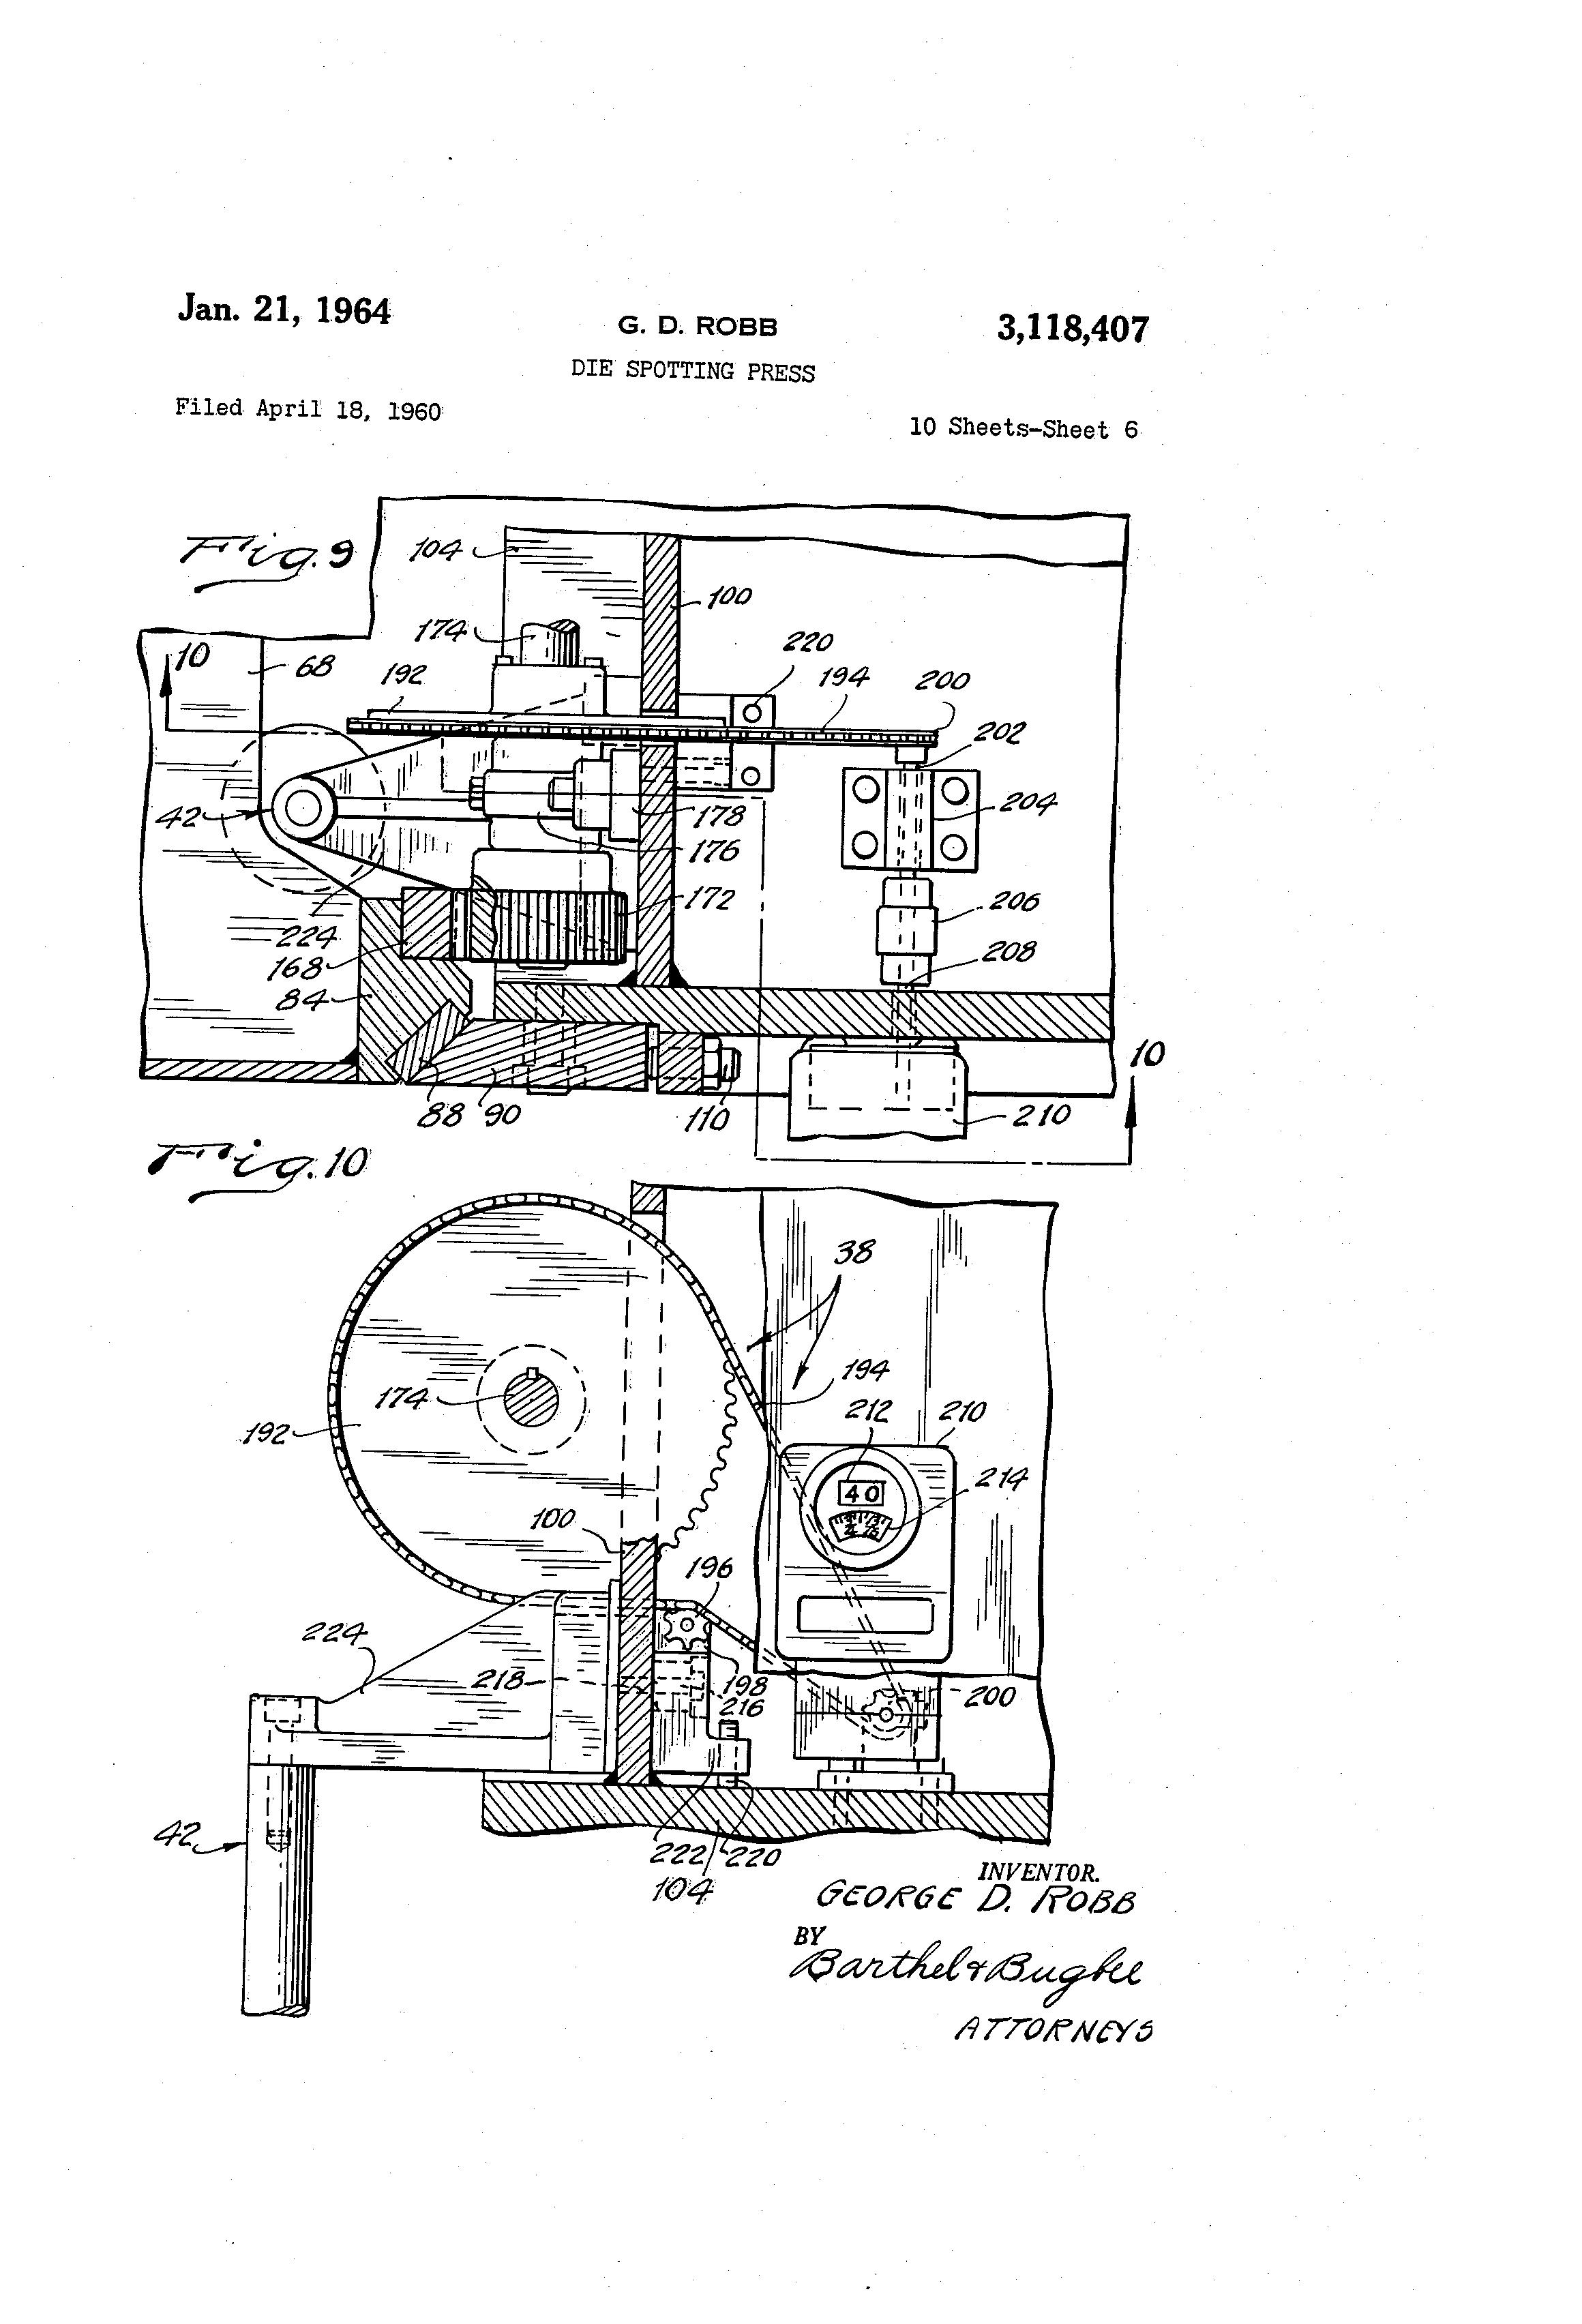 Wiring Diagram Furthermore Whirlpool Gold Dishwasher Parts Diagram